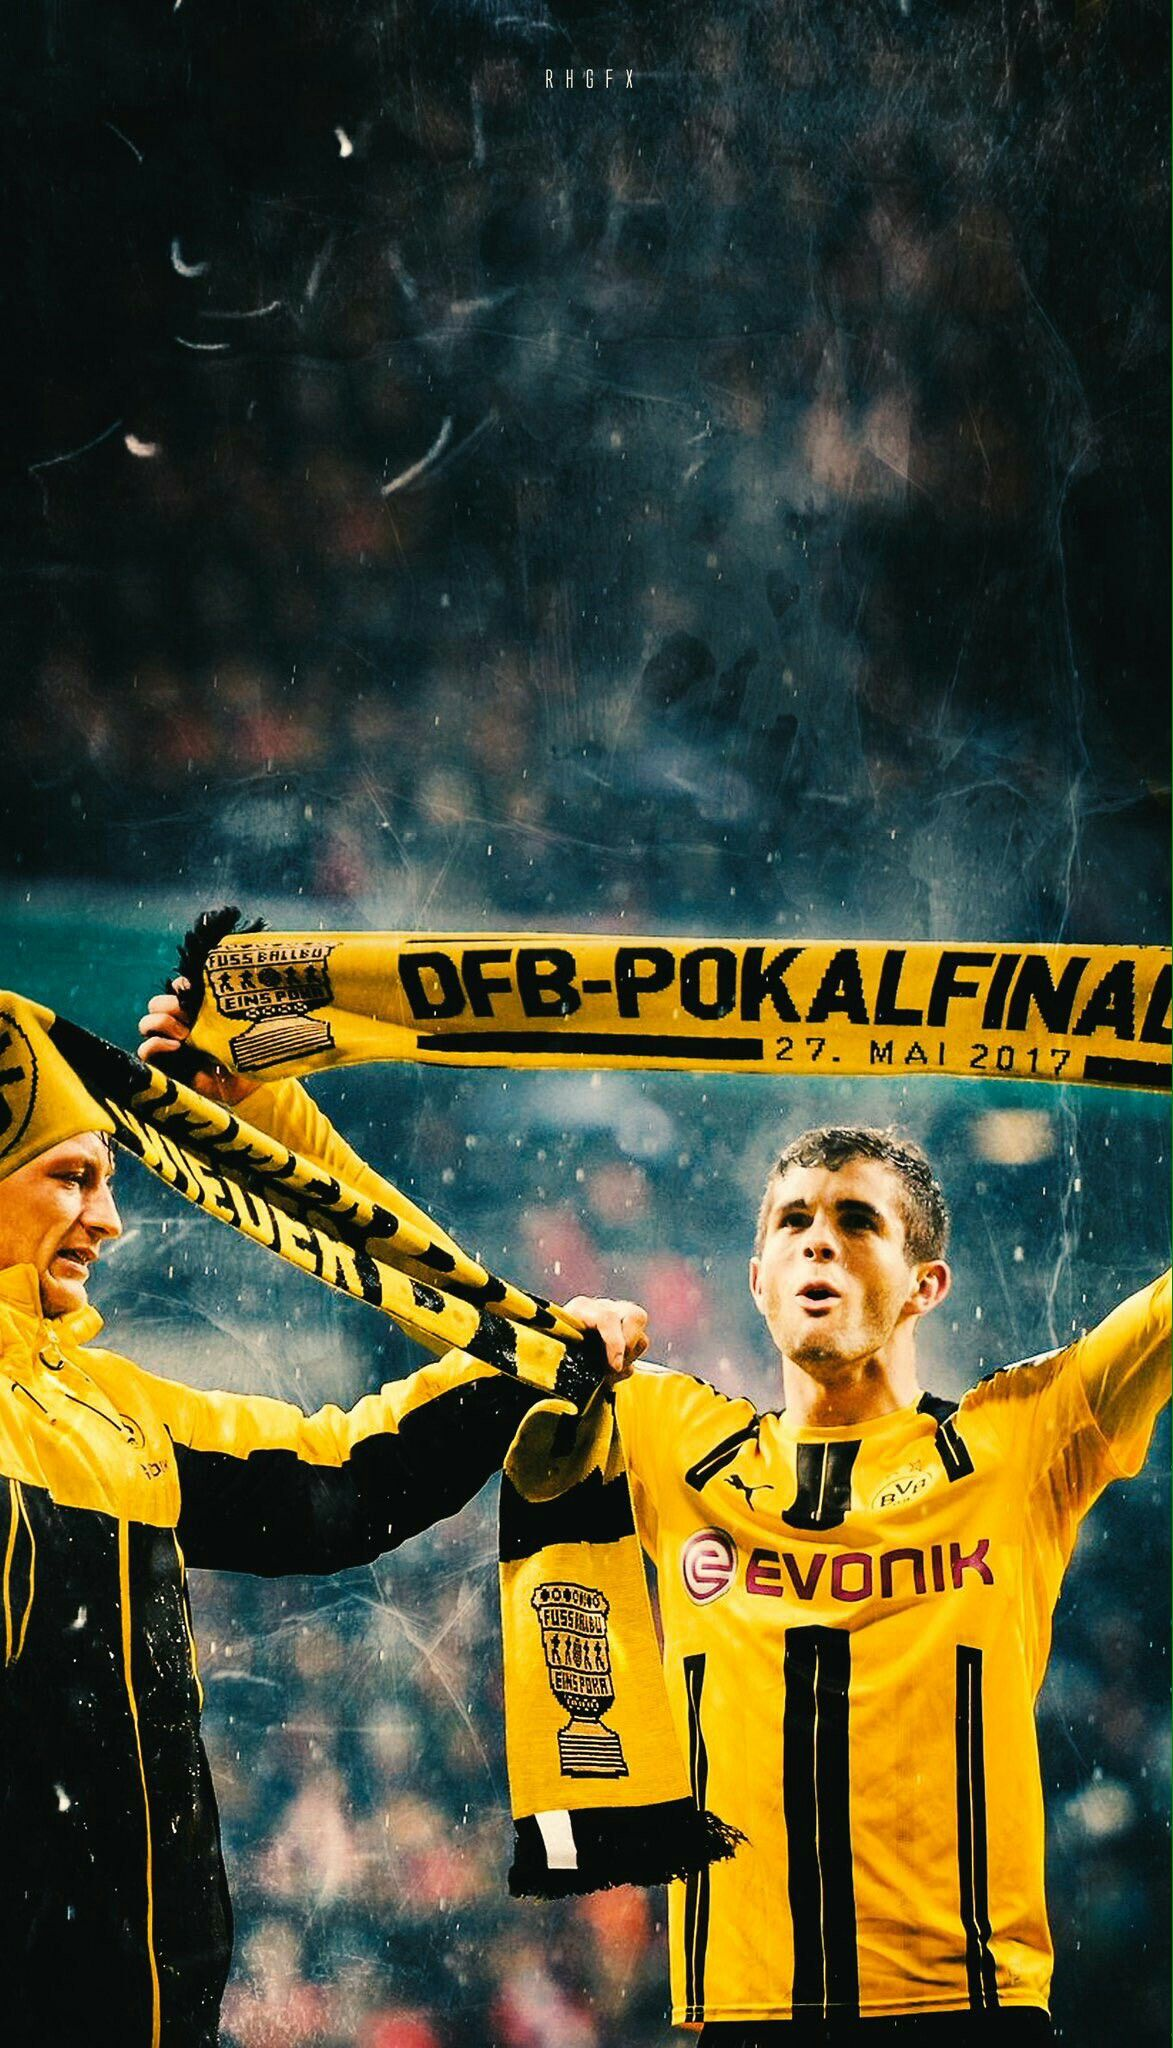 Pin Von Numellote Auf Borussia Dortmund Borussia Dortmund